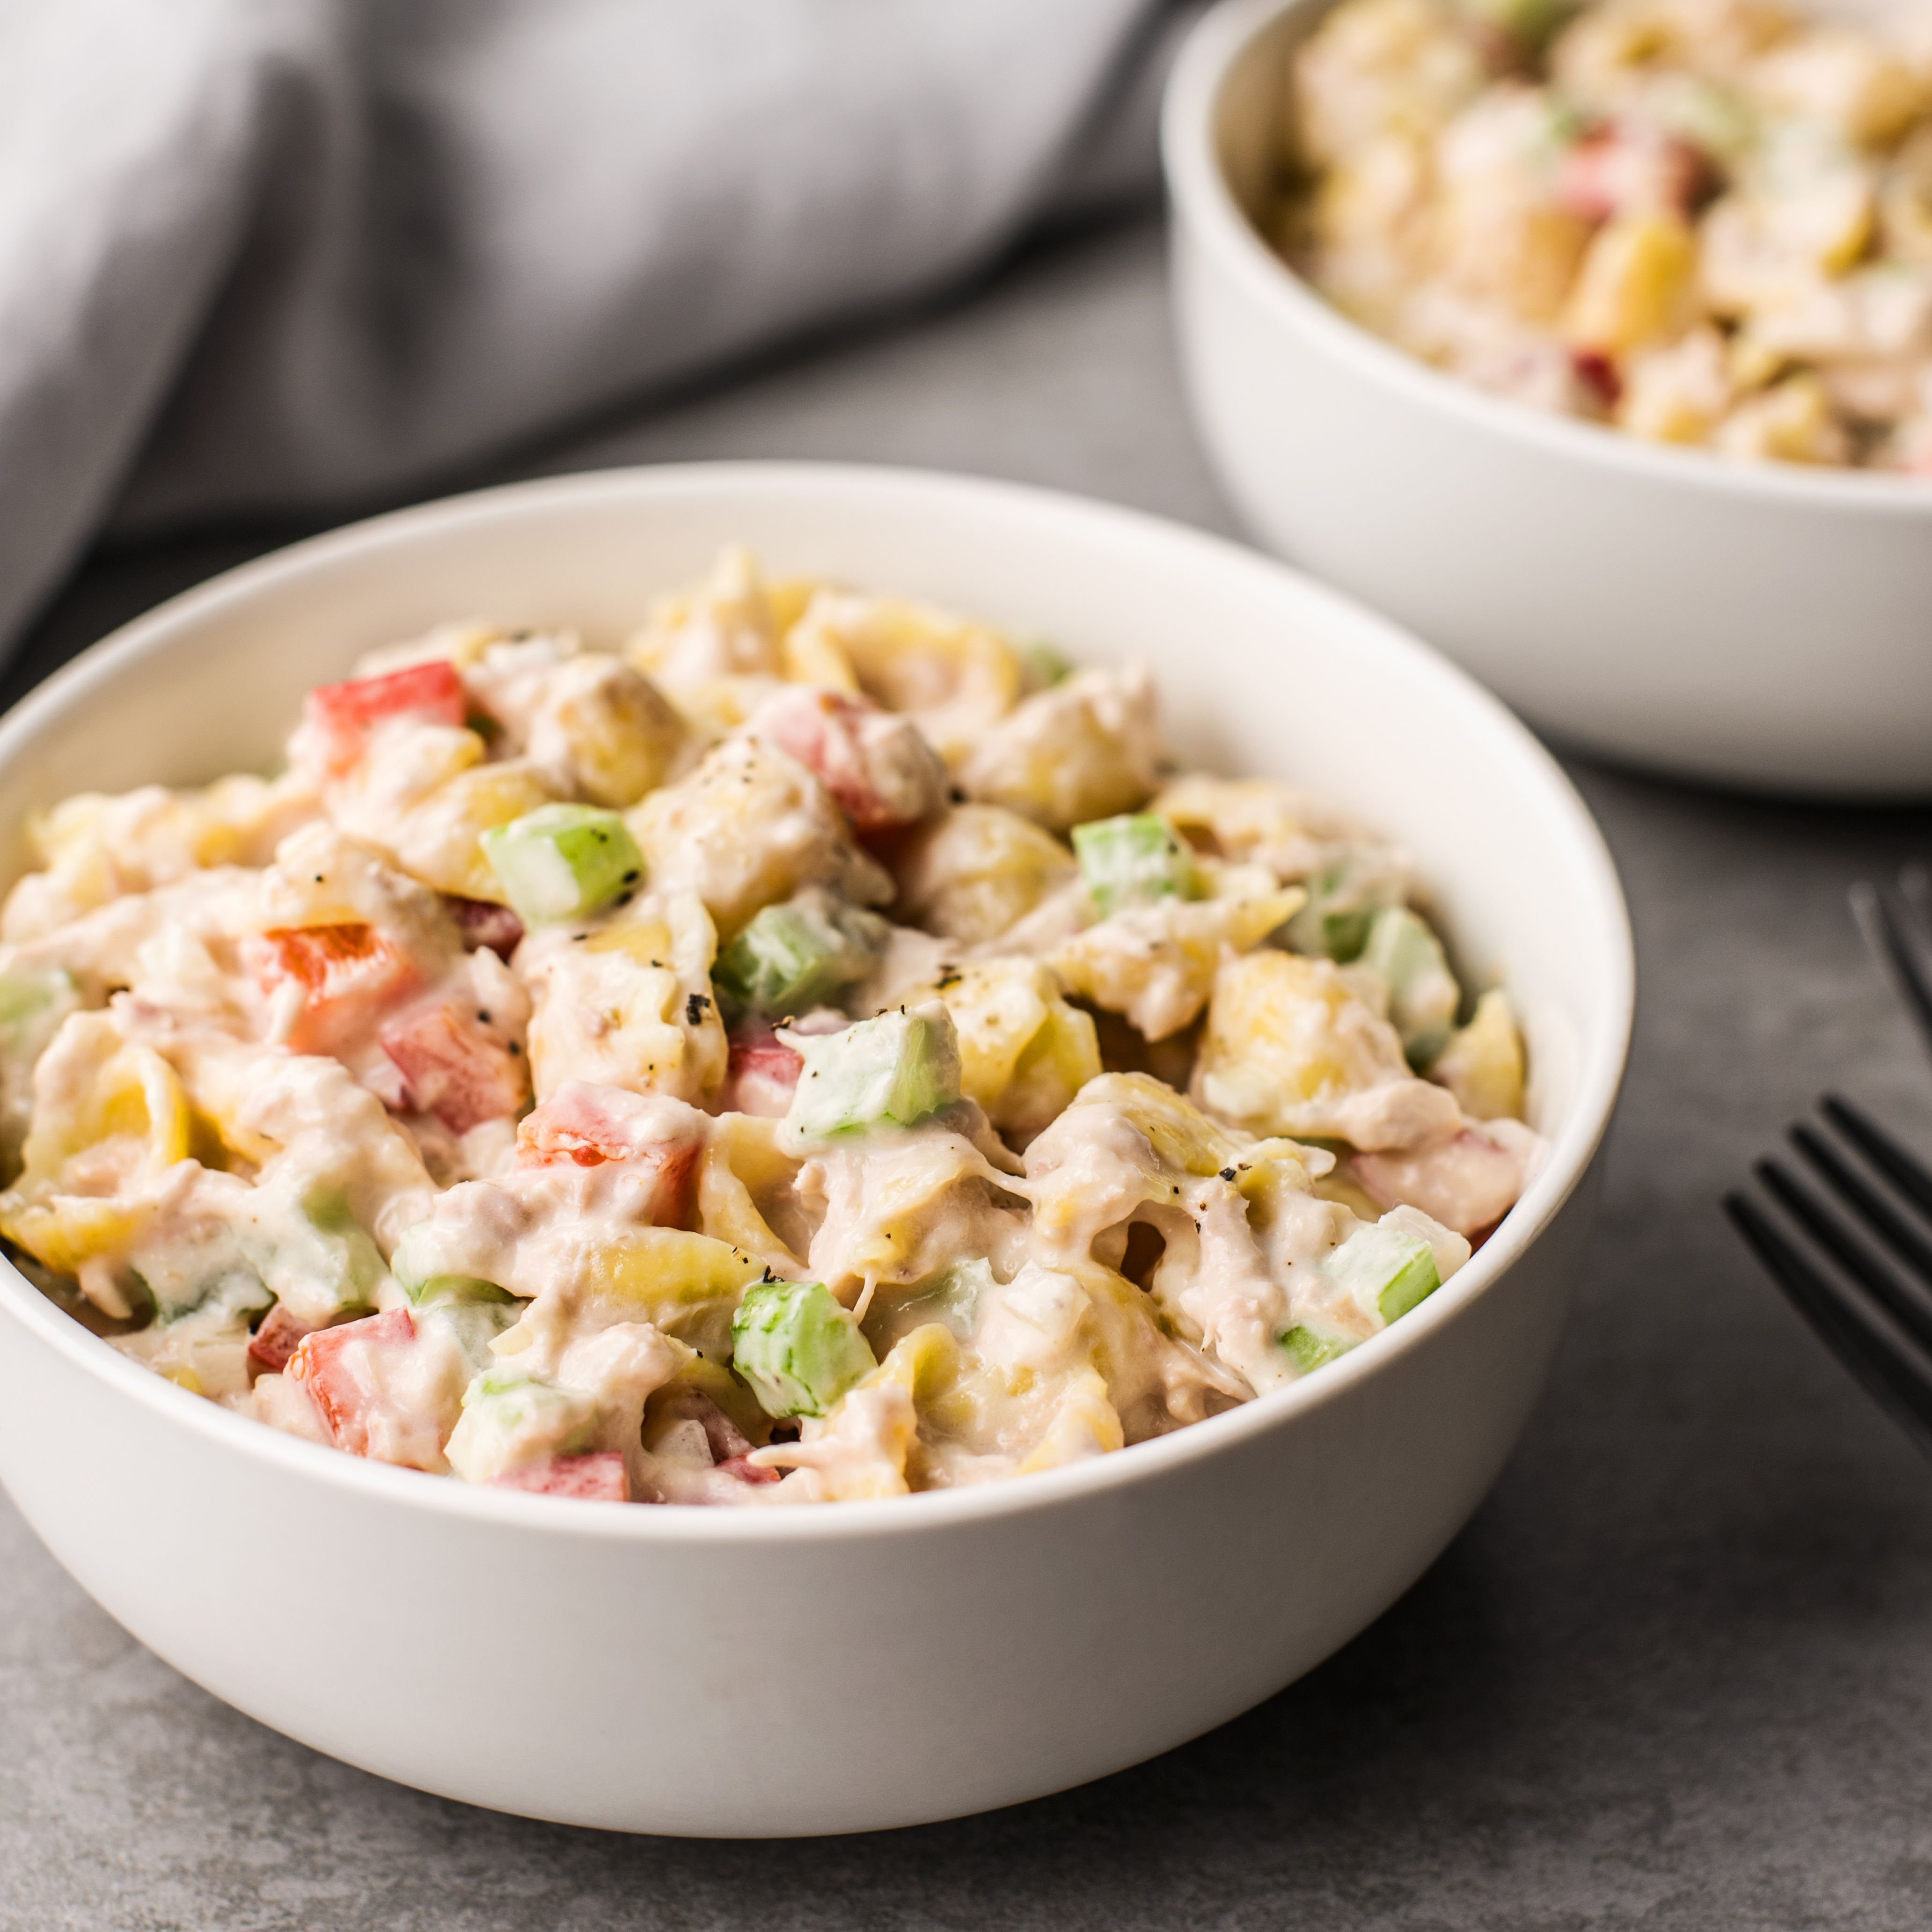 Tuna Salad Recipes With Pasta